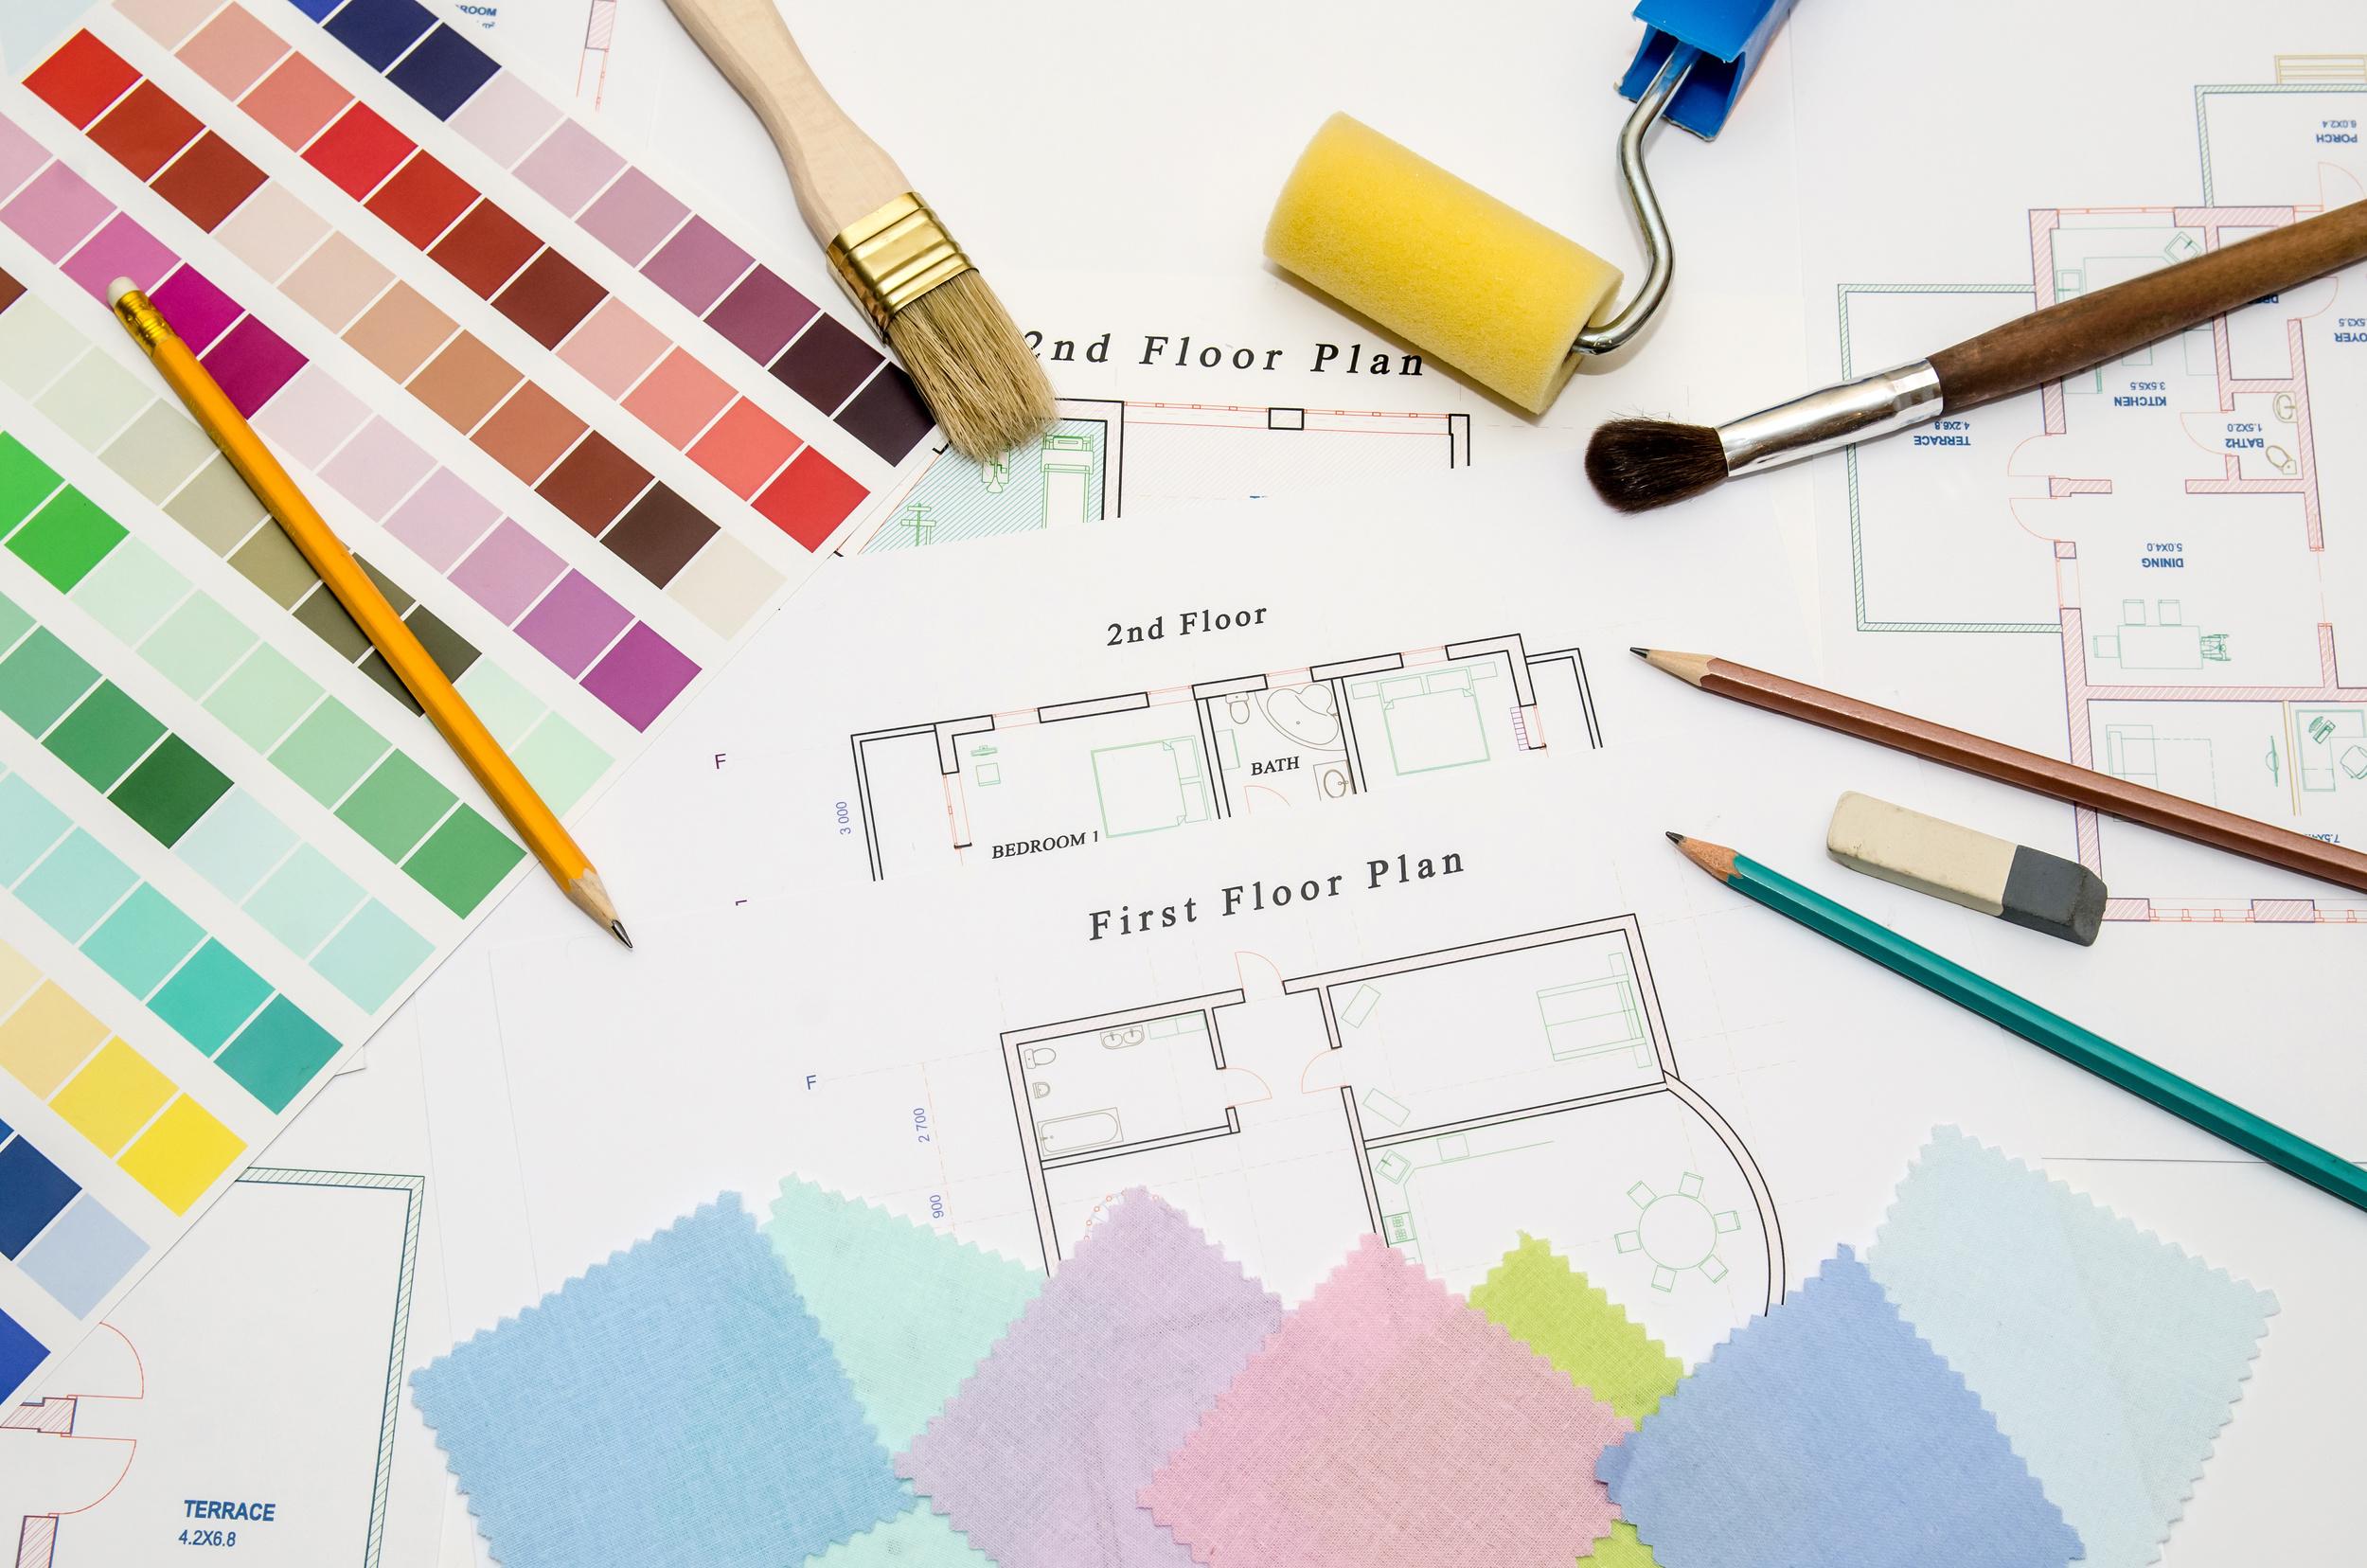 plans-for-interior-design-of-new-home.jpg